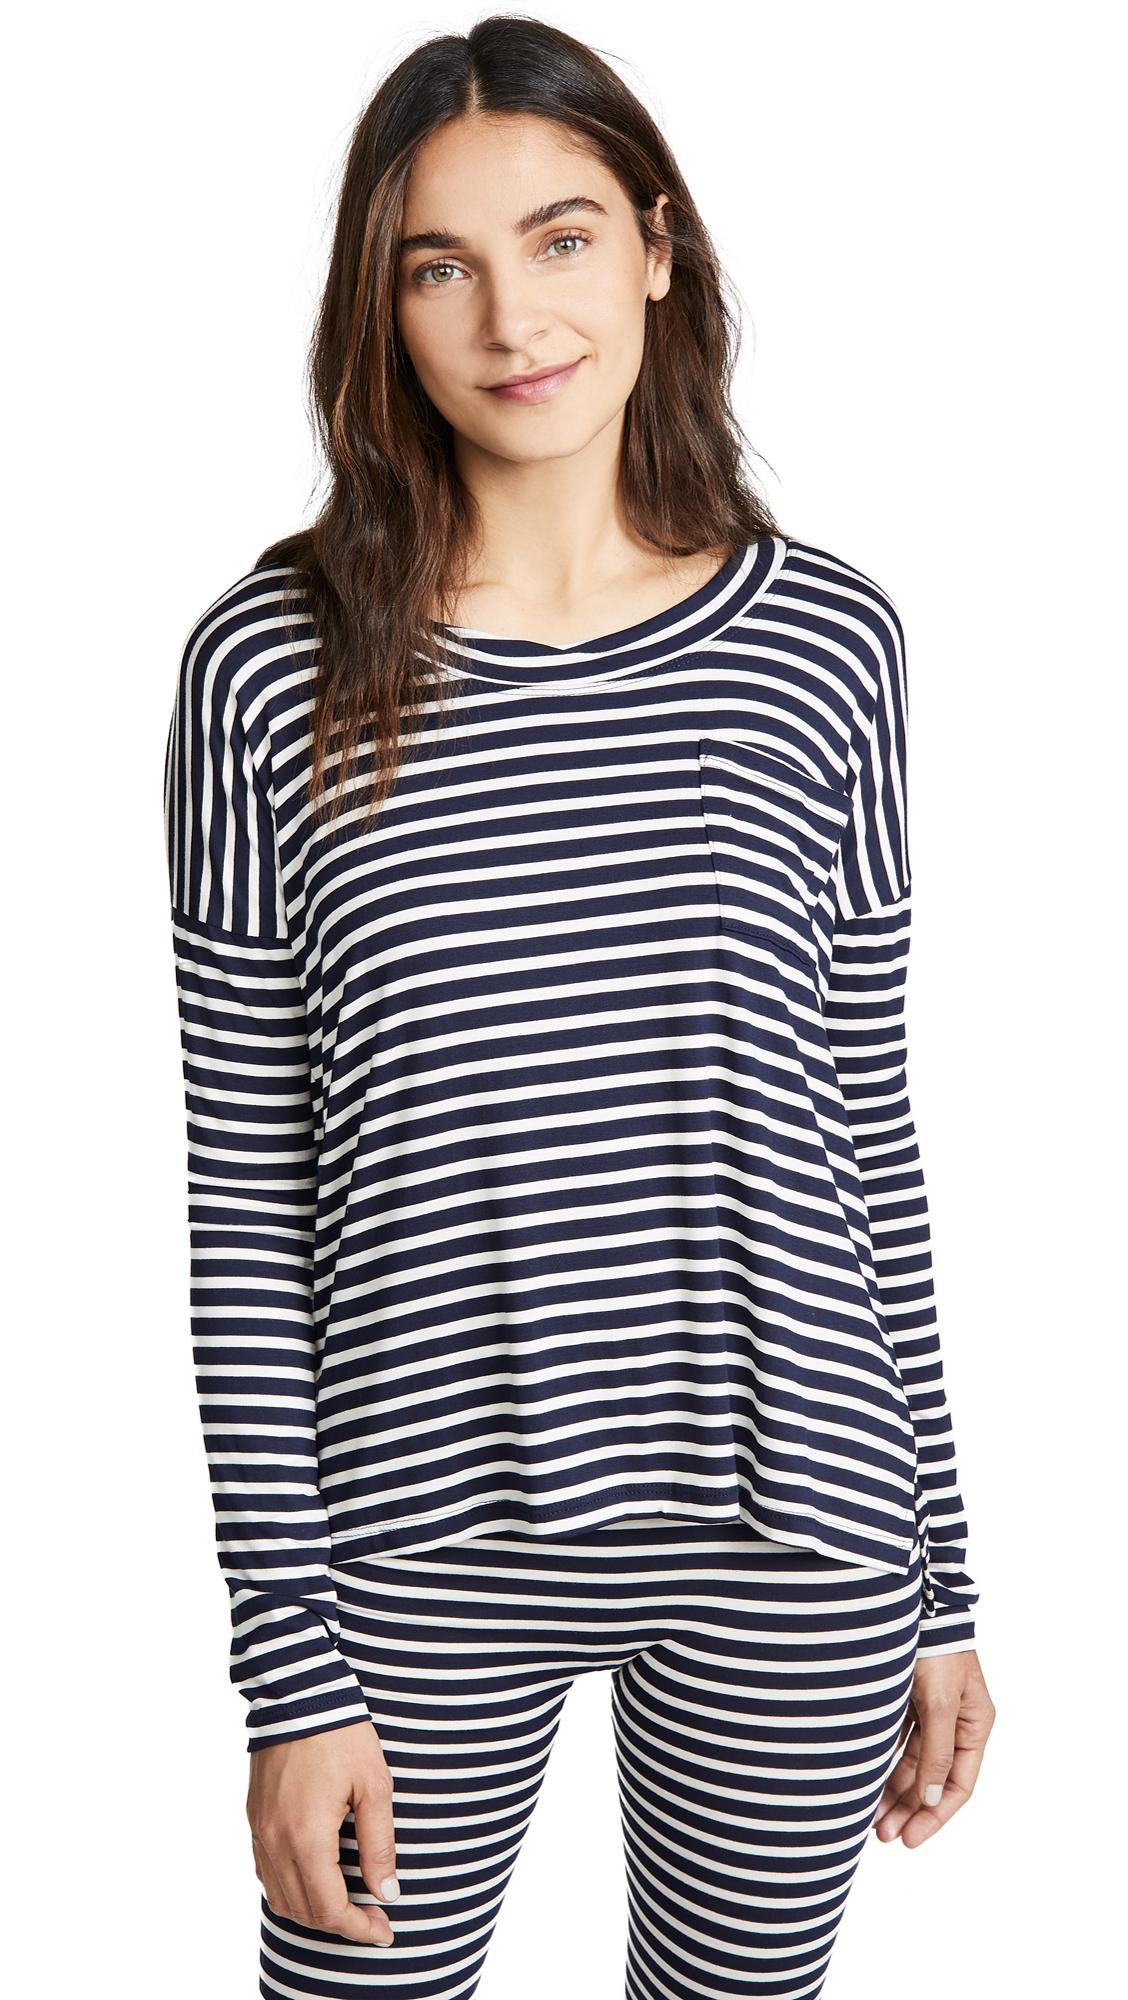 MAISON DU SOIR Edith Pajama Top in Navy Stripe